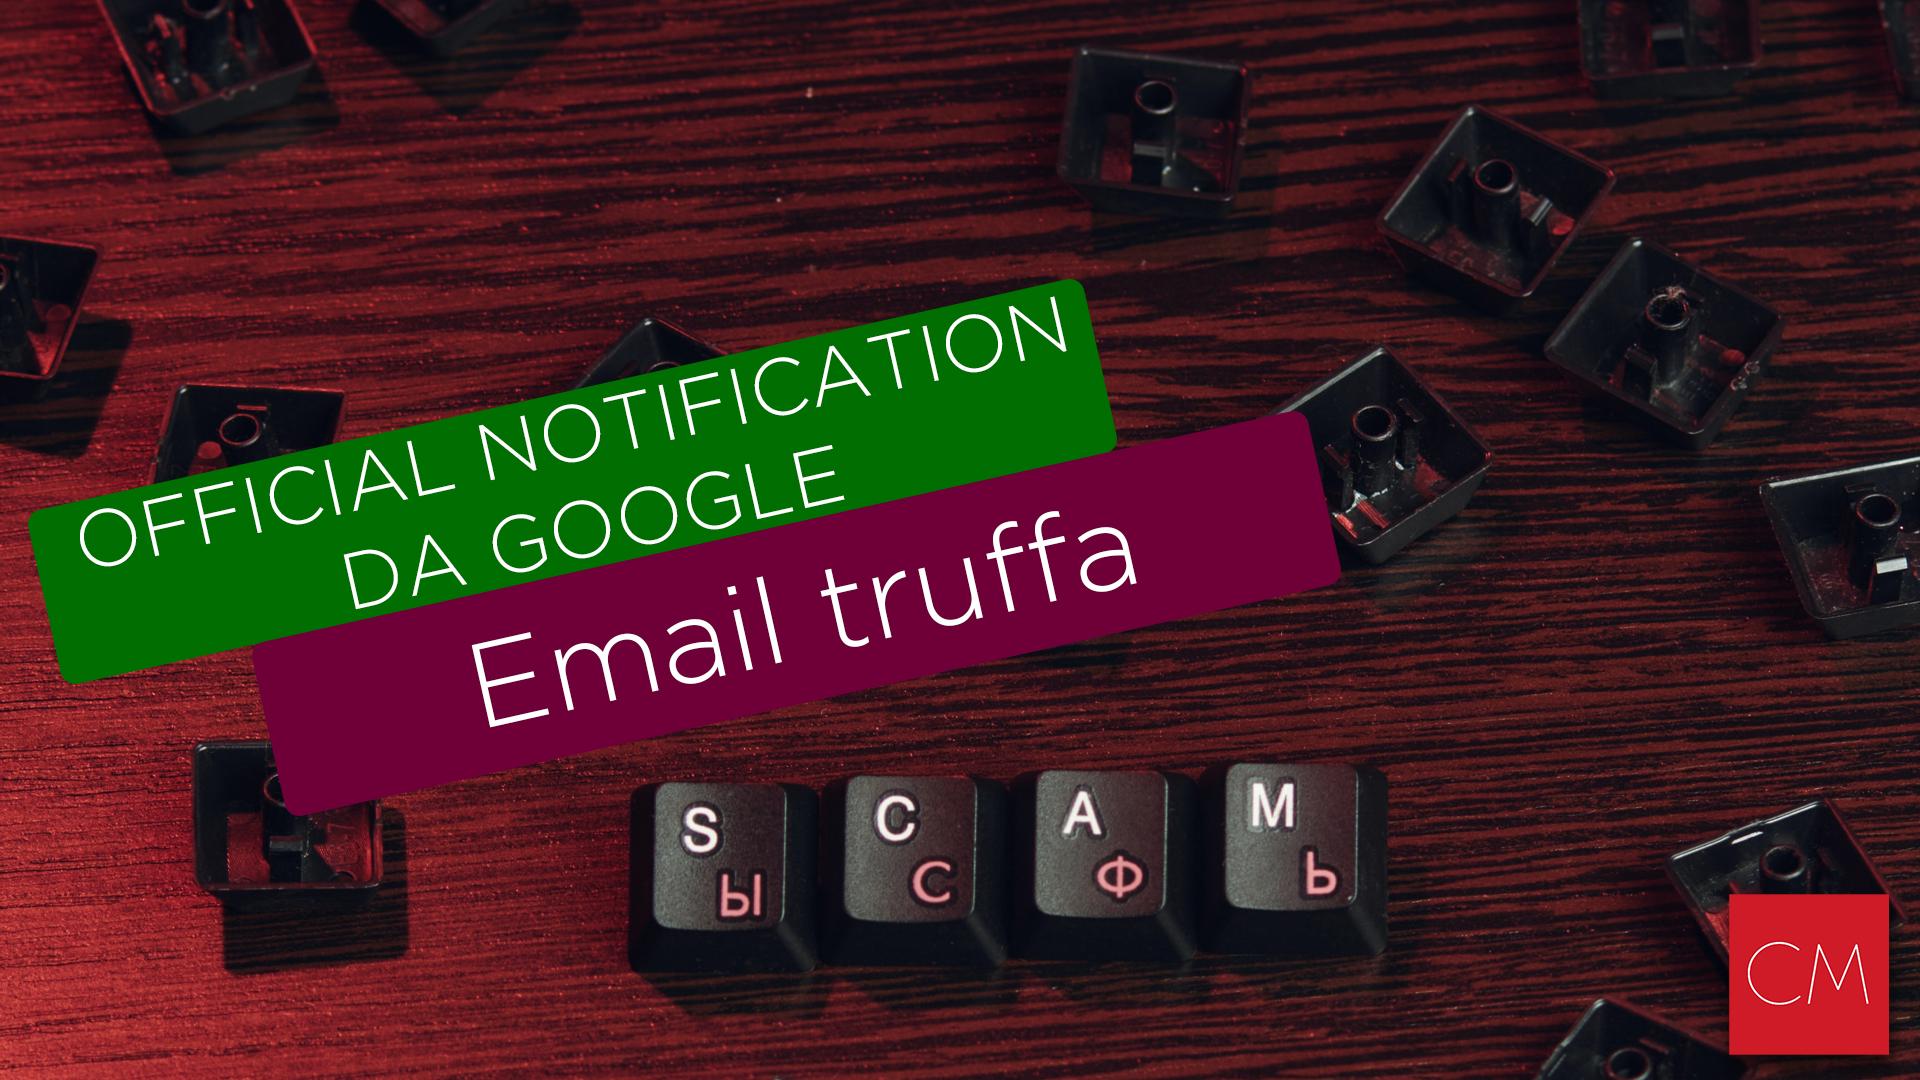 Official Notification da Google – Email Truffa